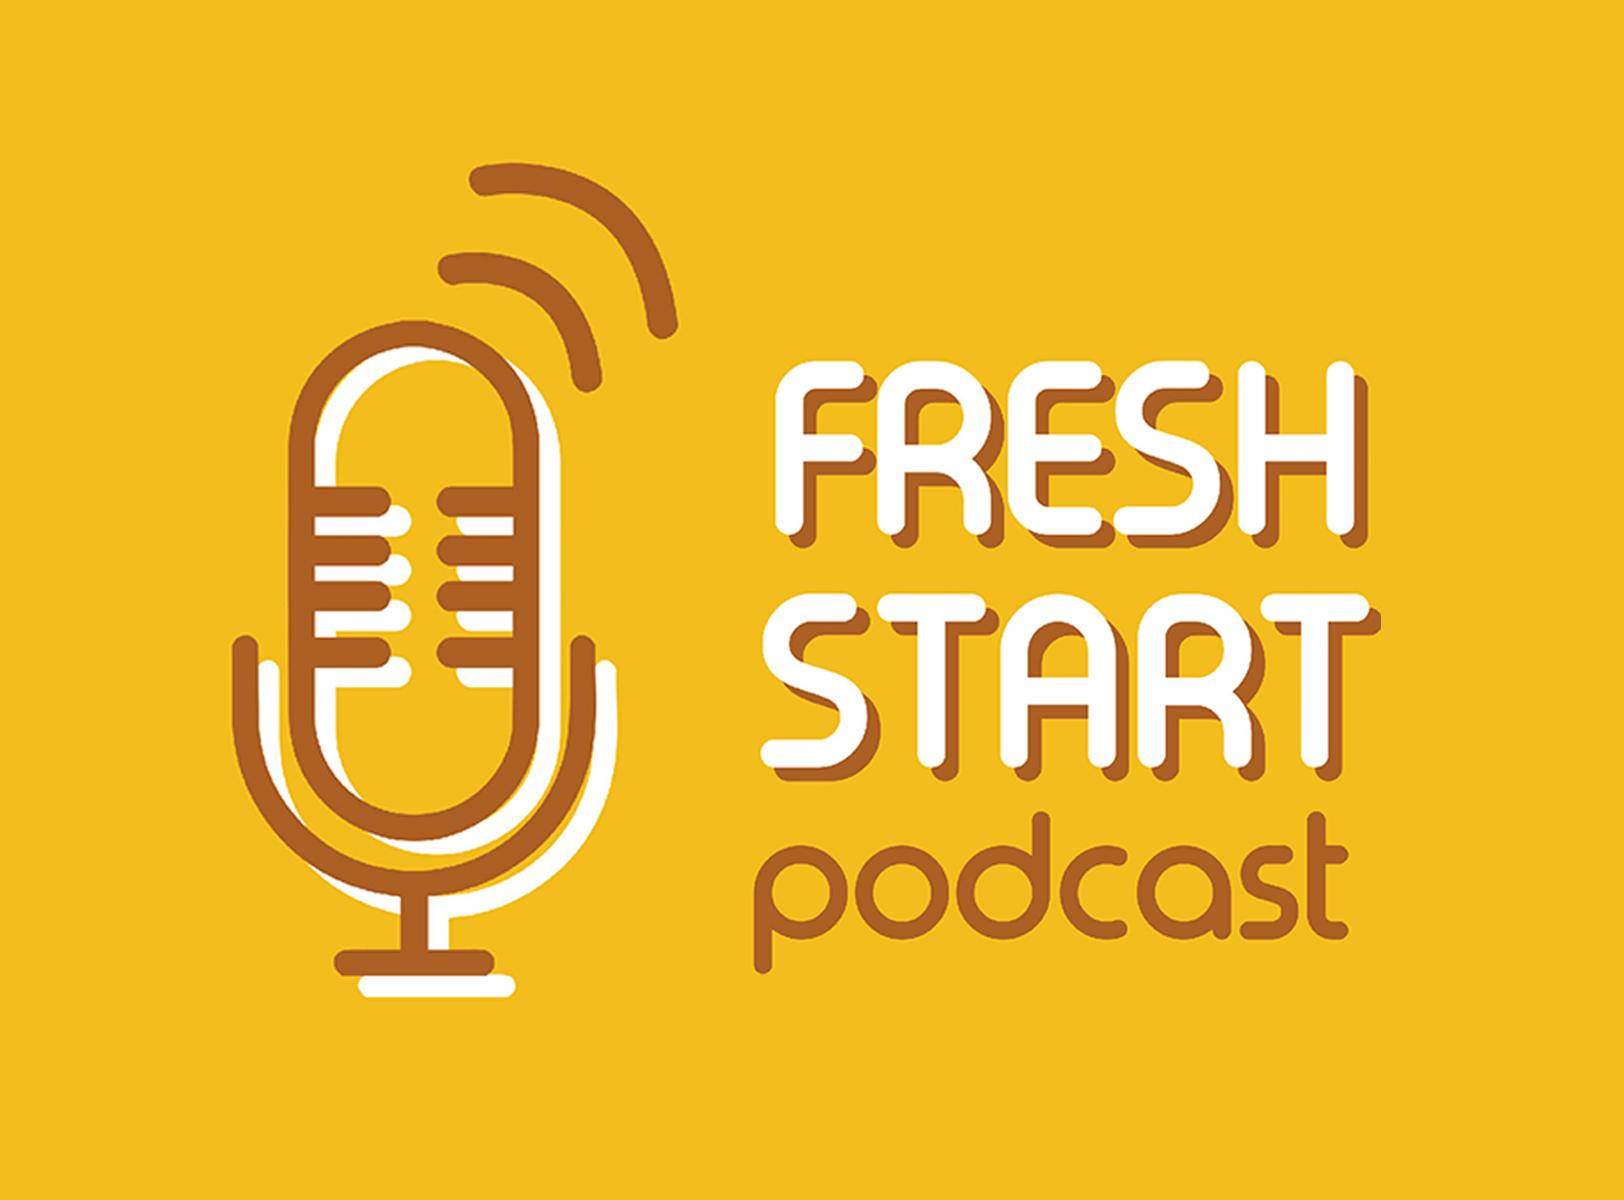 Fresh Start: Podcast News (7/16/2019 Tue.)